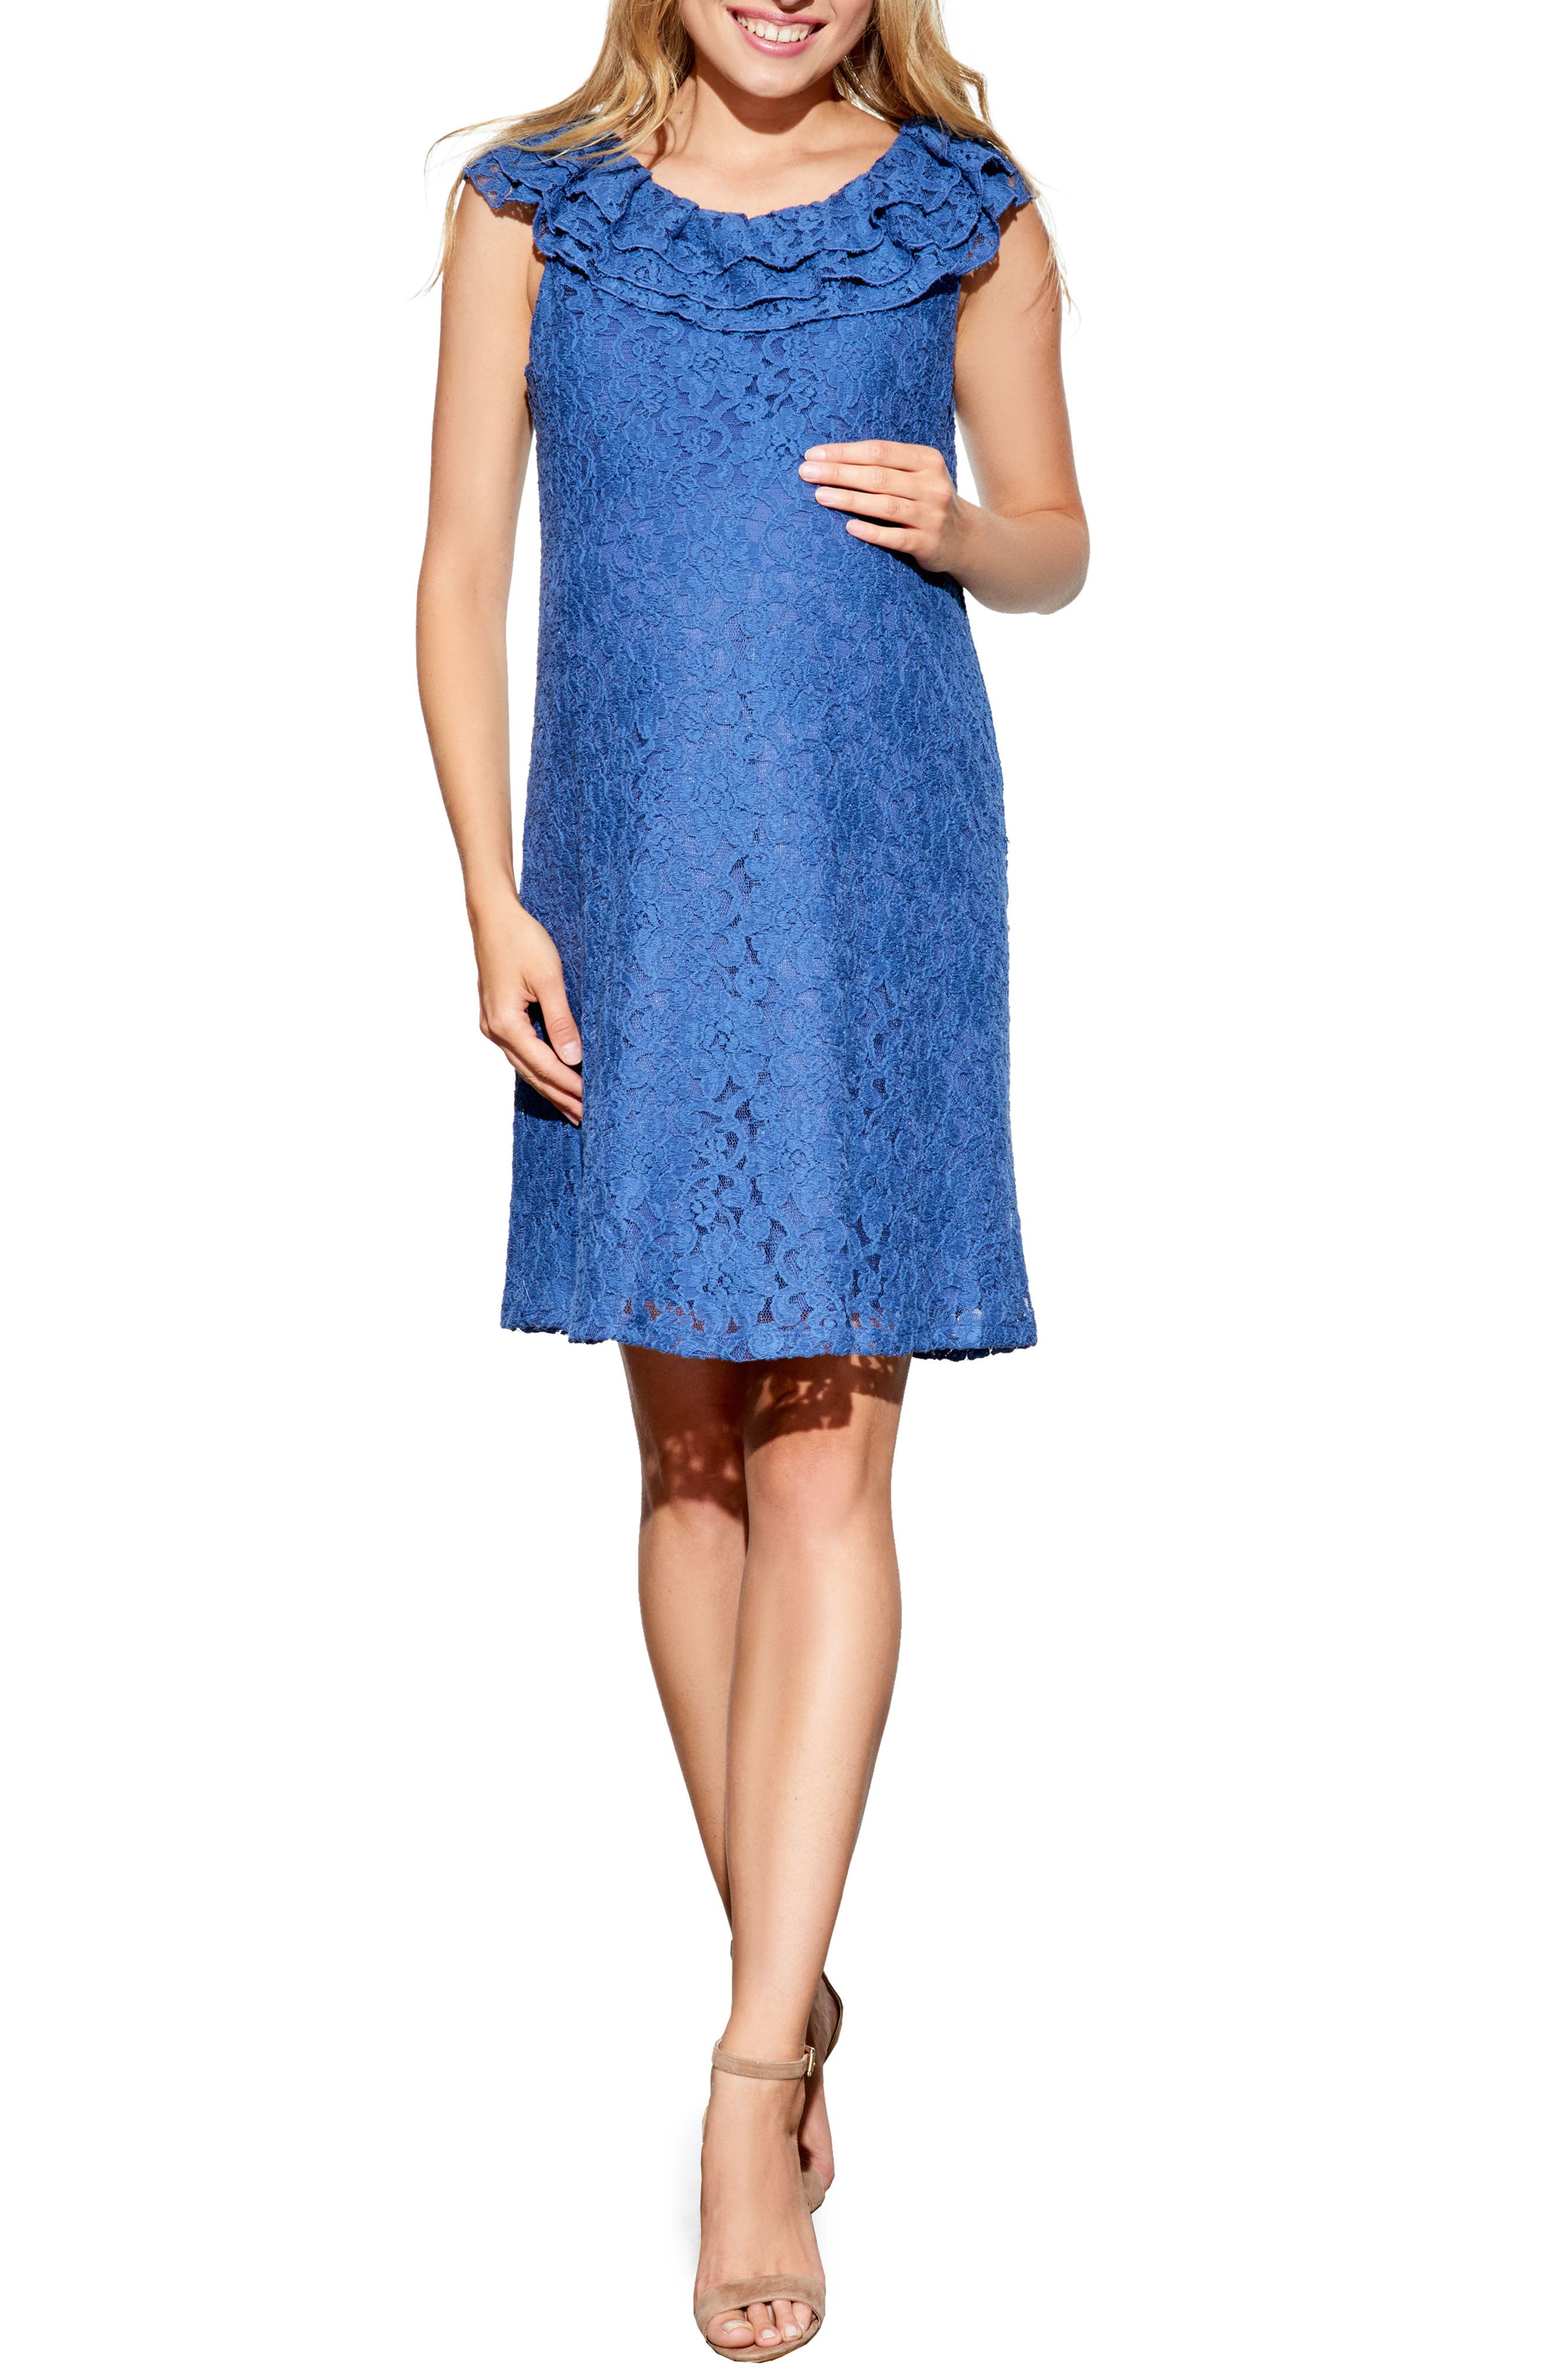 Maternal America Ruffled Maternity Dress, Blue